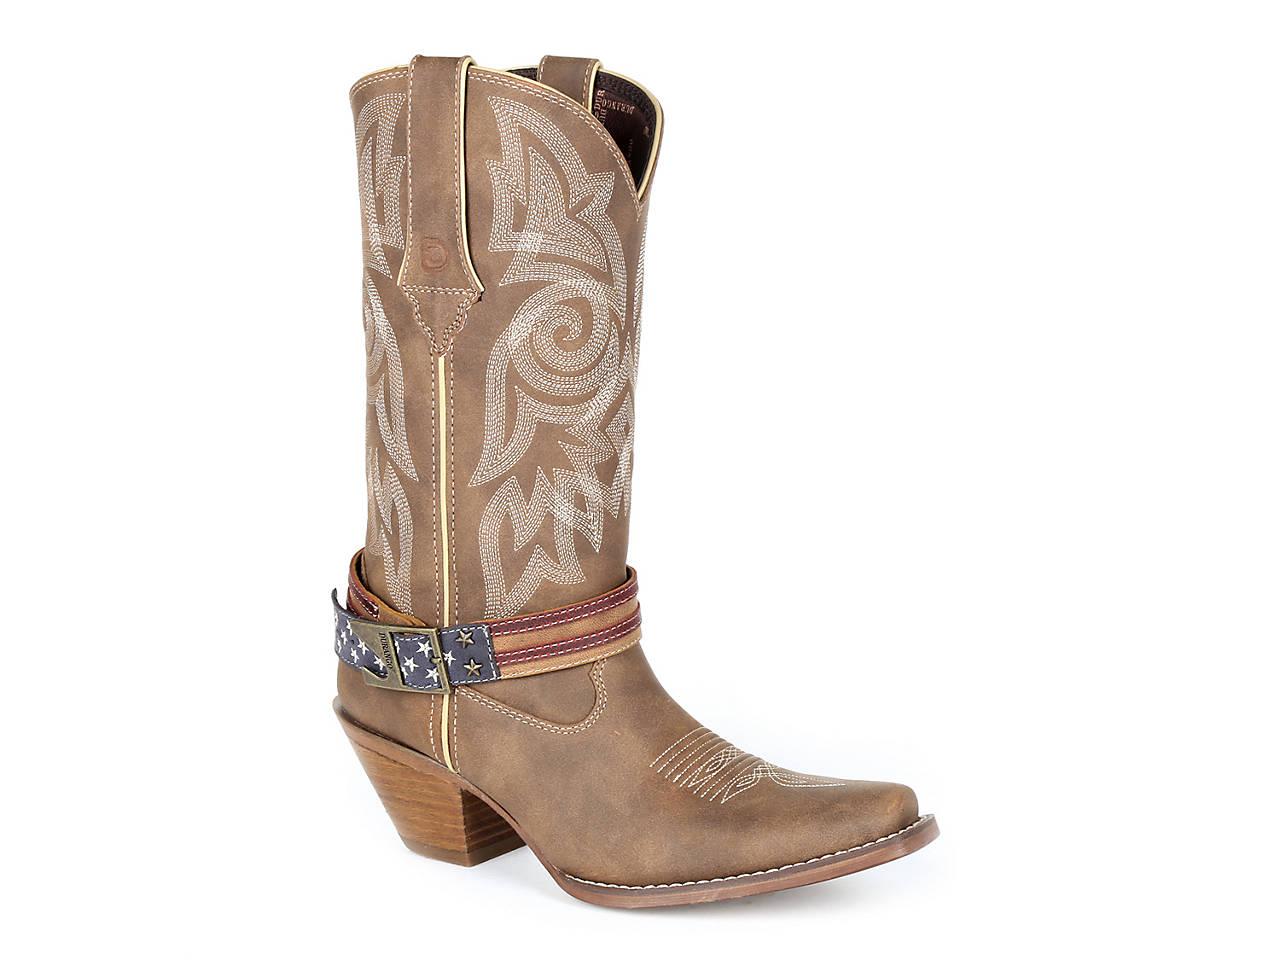 f09897b17c75c4 Durango Flag Strap Cowboy Boot Women s Shoes